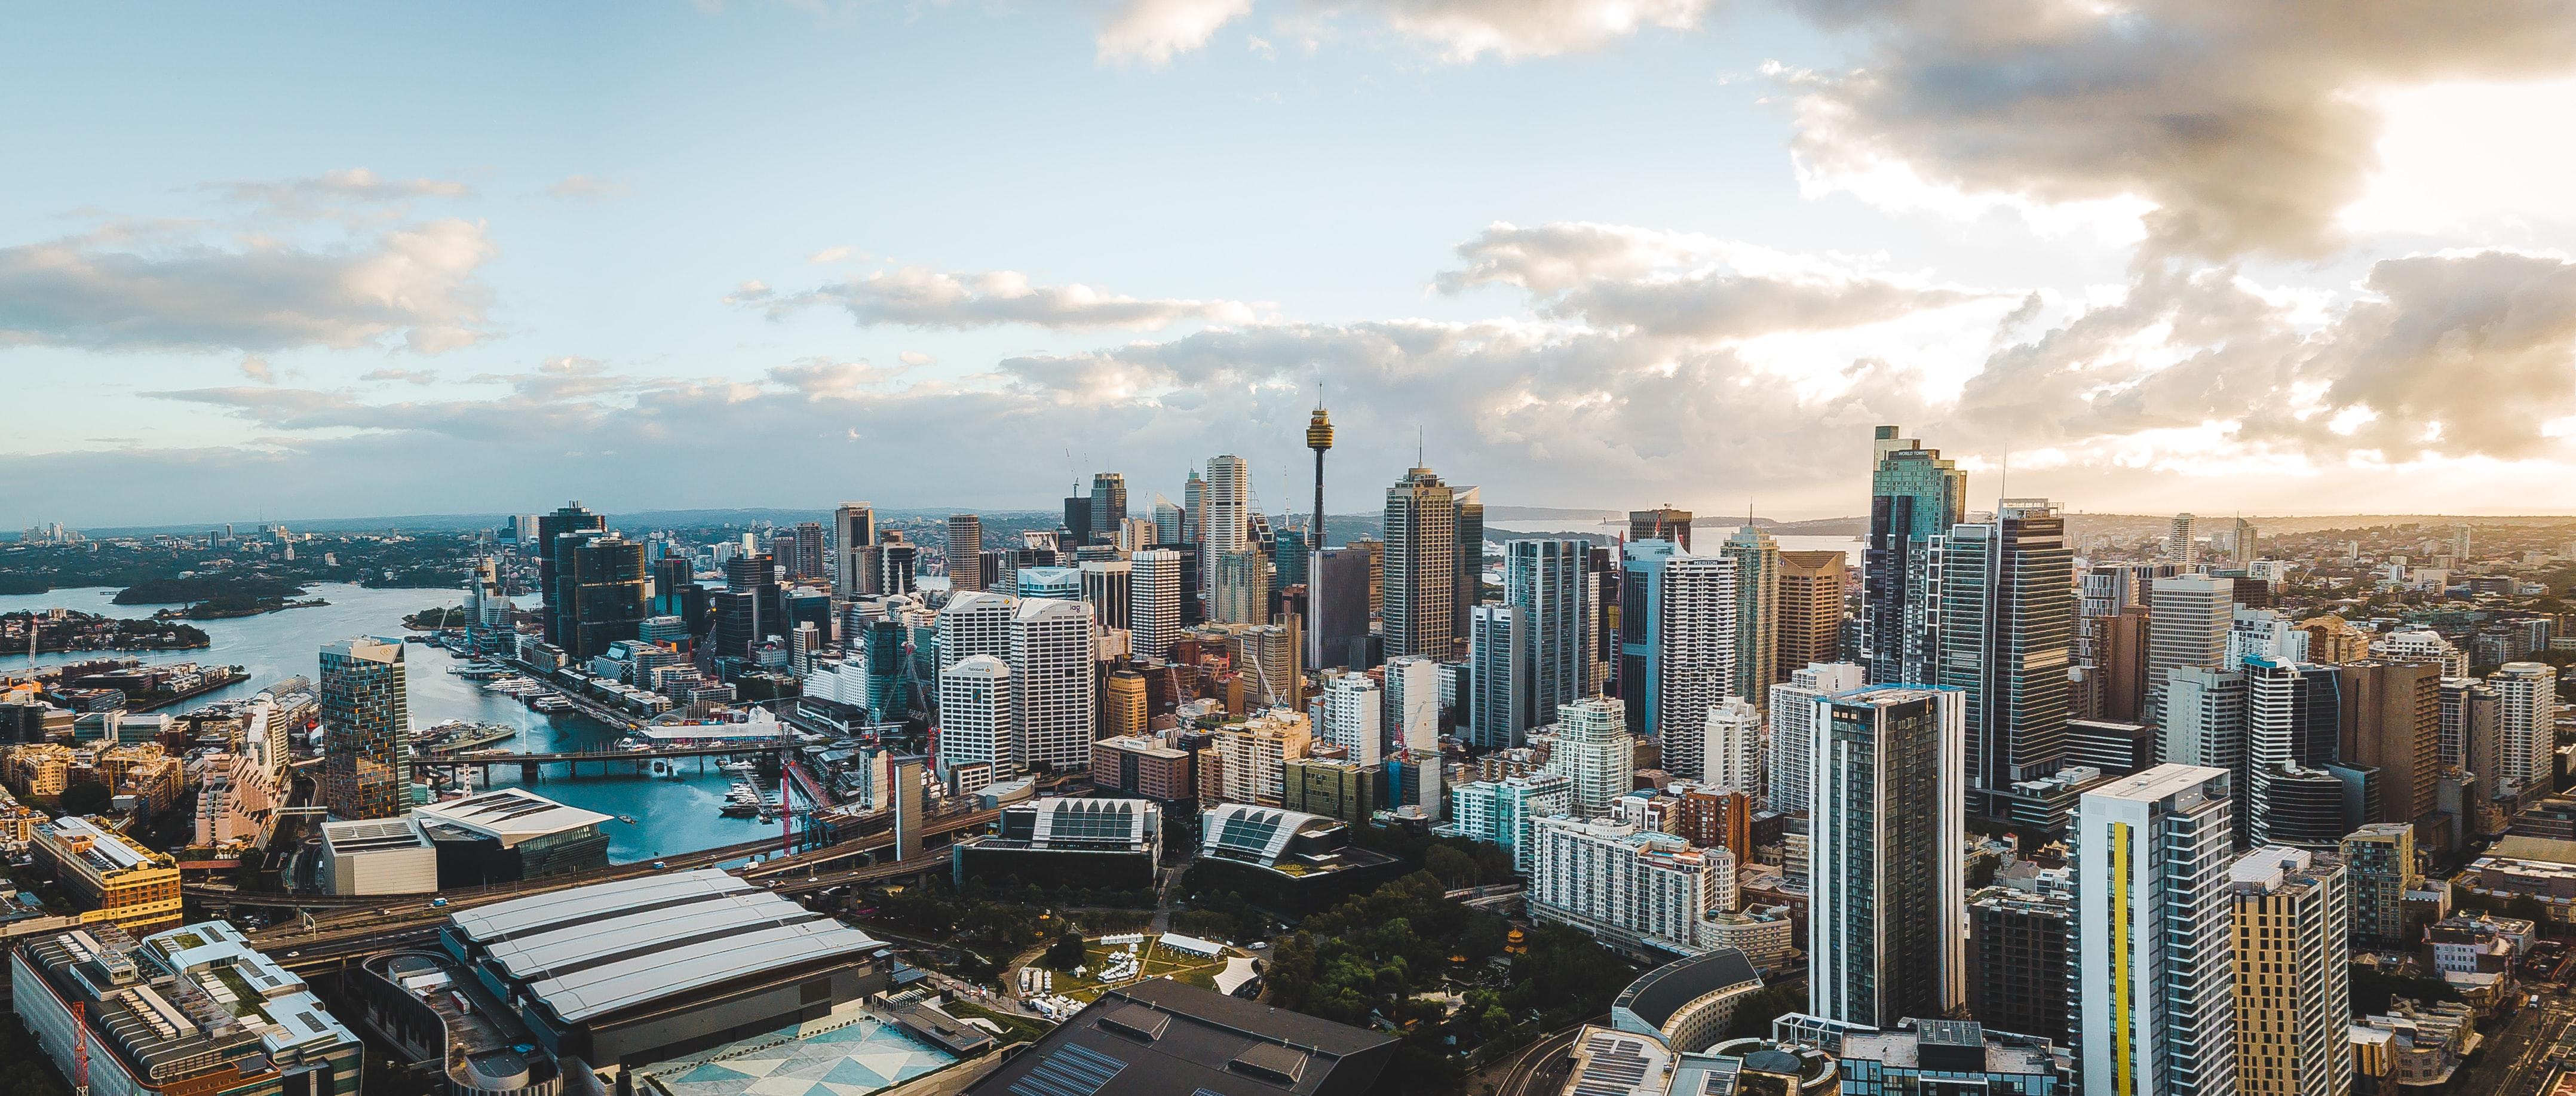 The City of Sydney Now Runs on 100% Renewable Energy